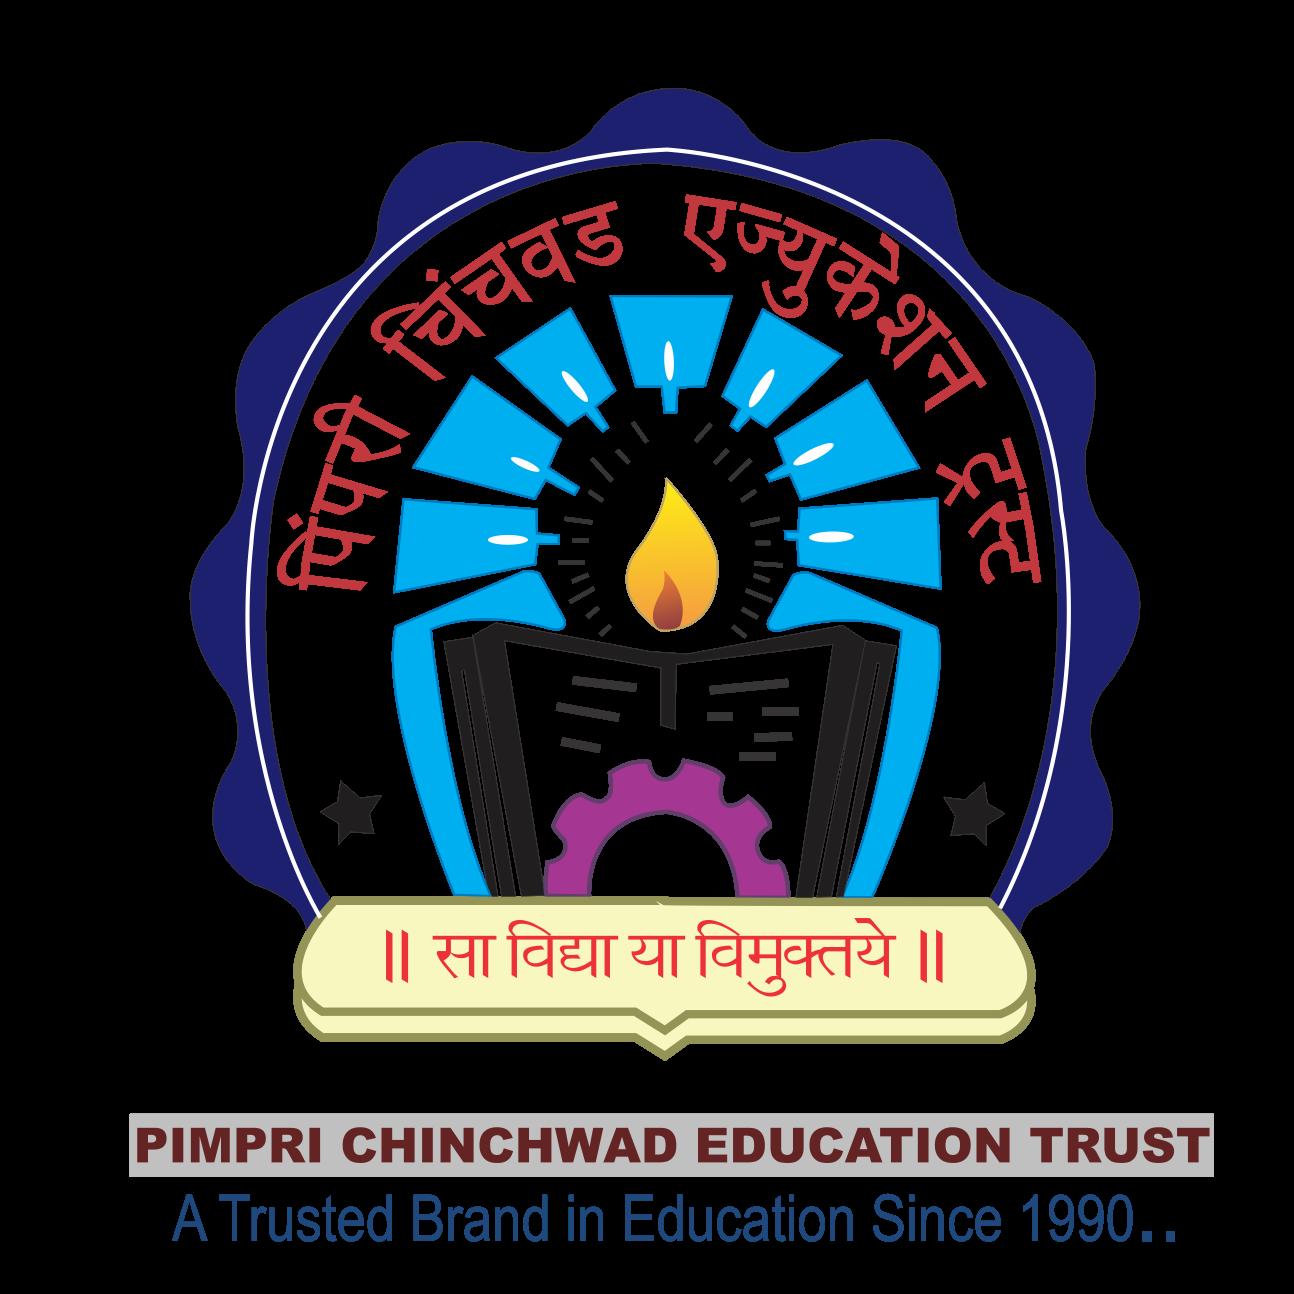 PCET Trust Logo